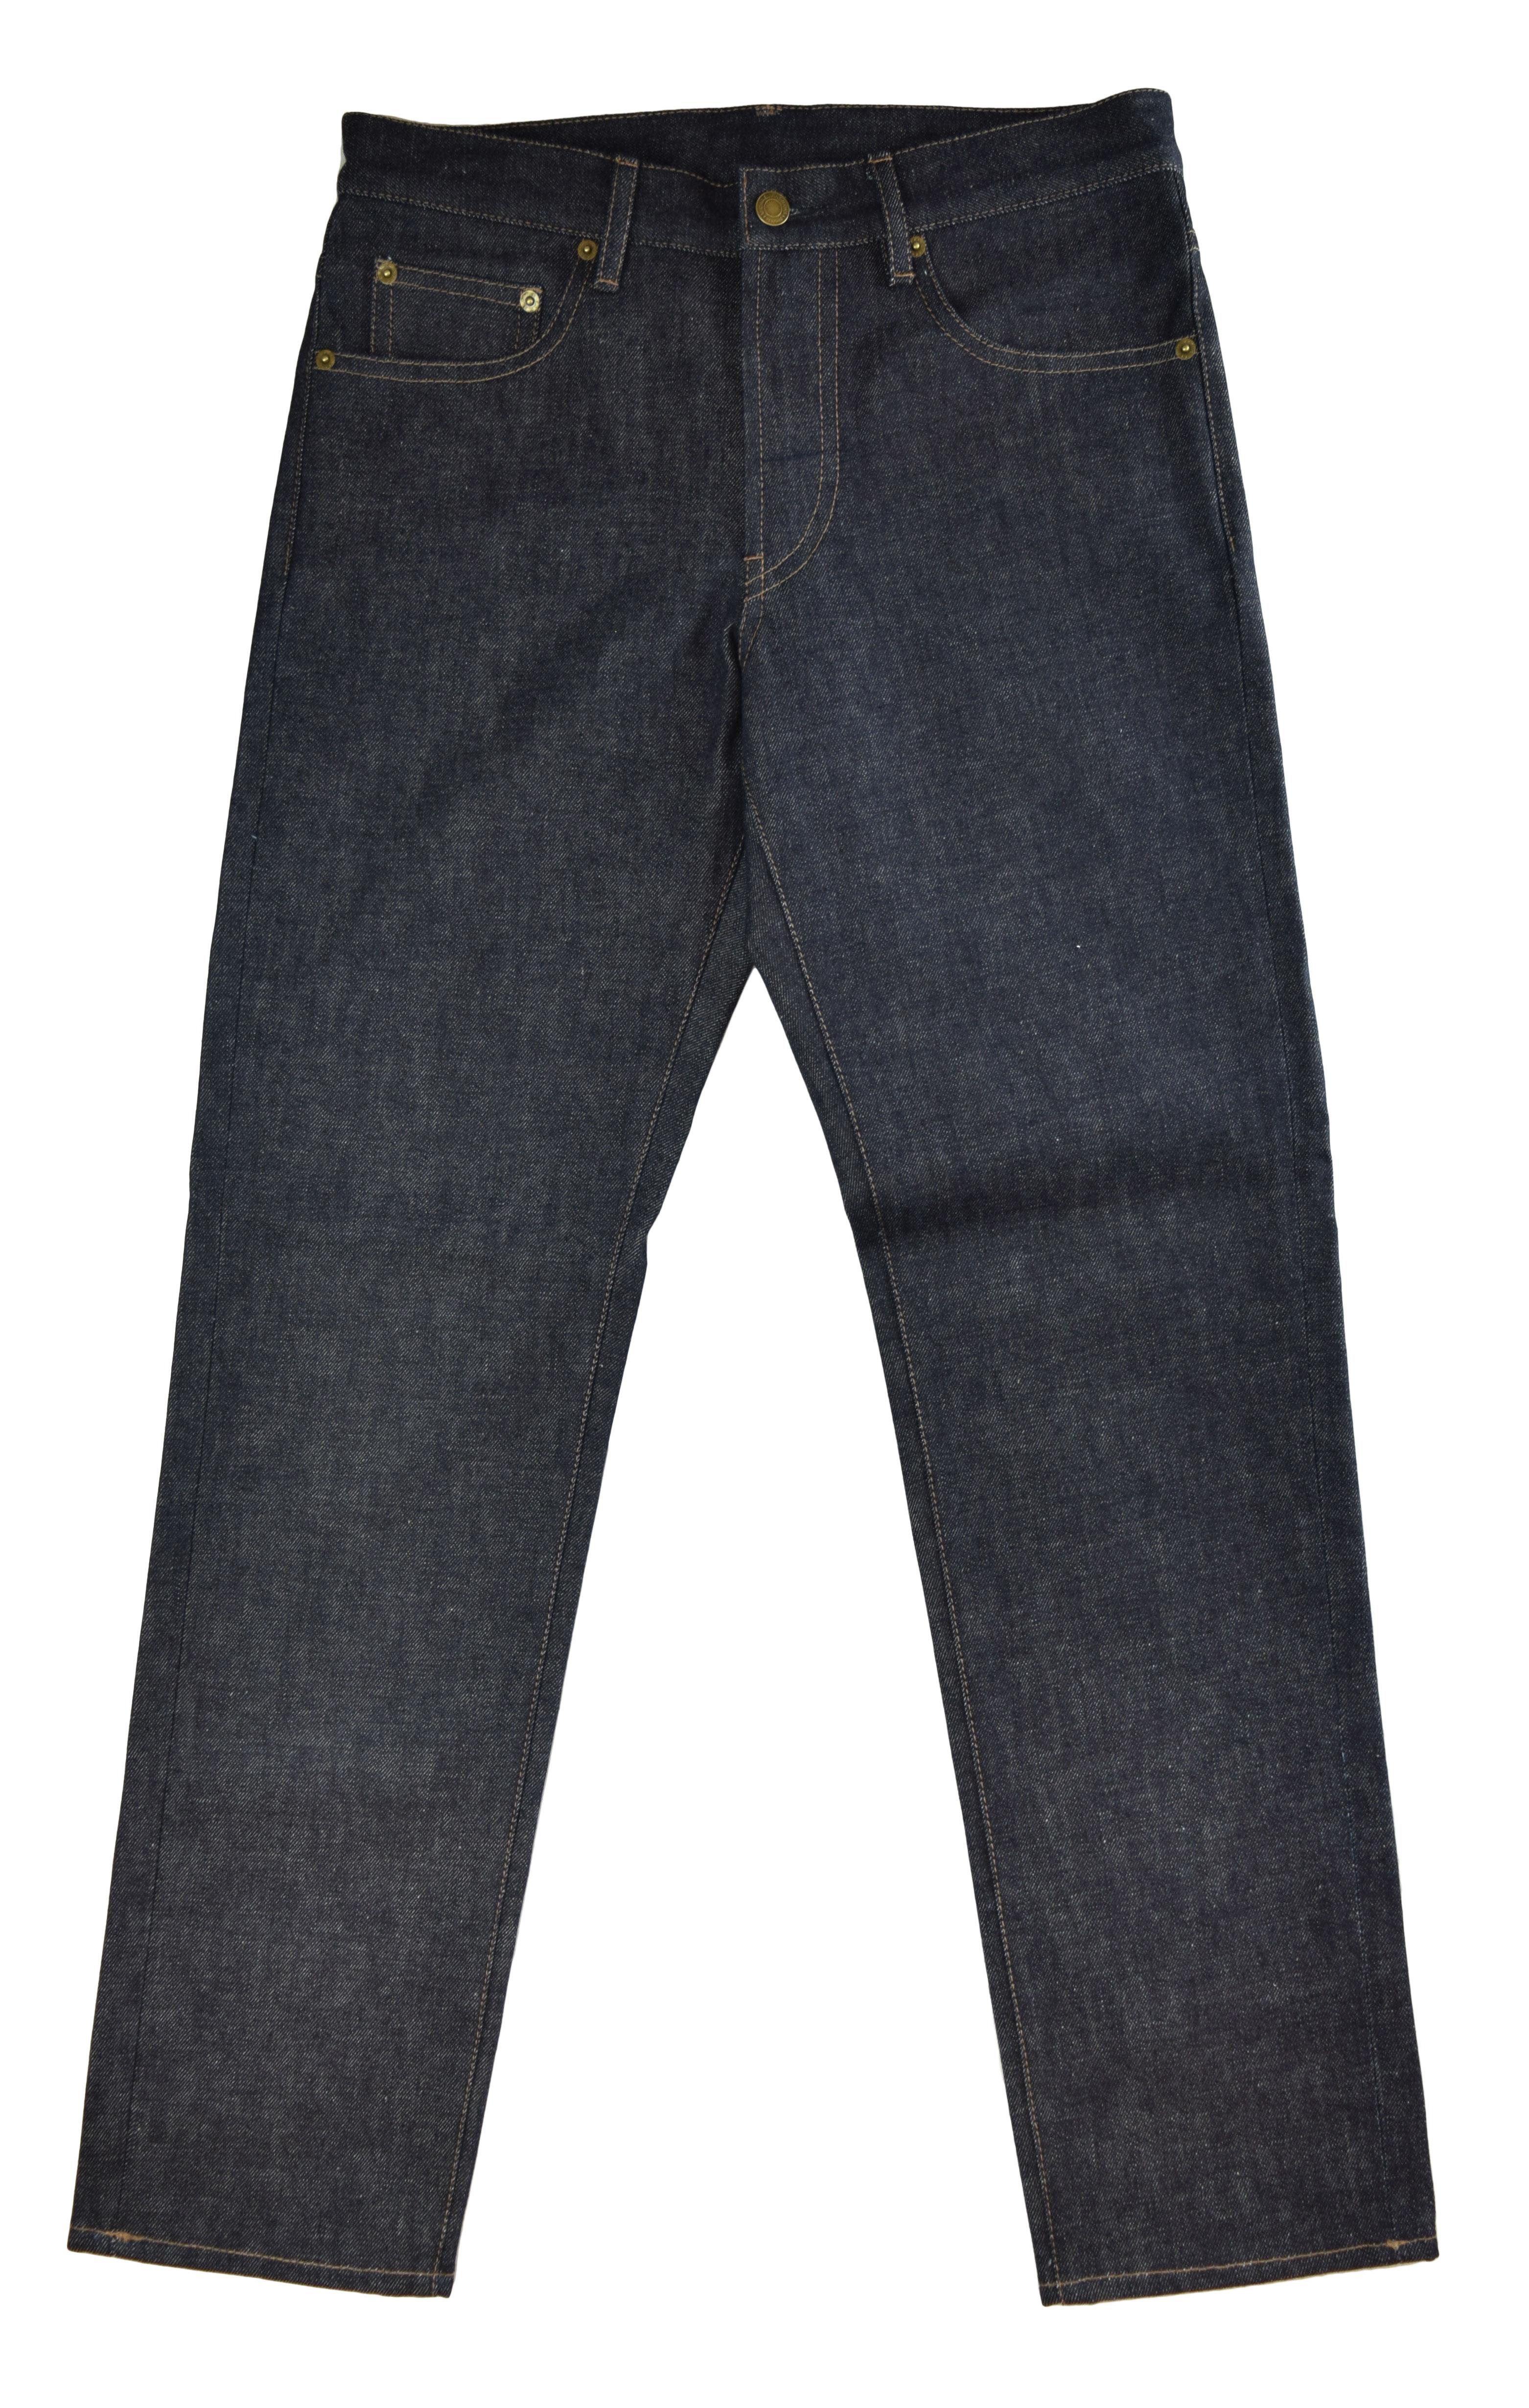 Deep Indigo Medium Weight Selvedge Jeans